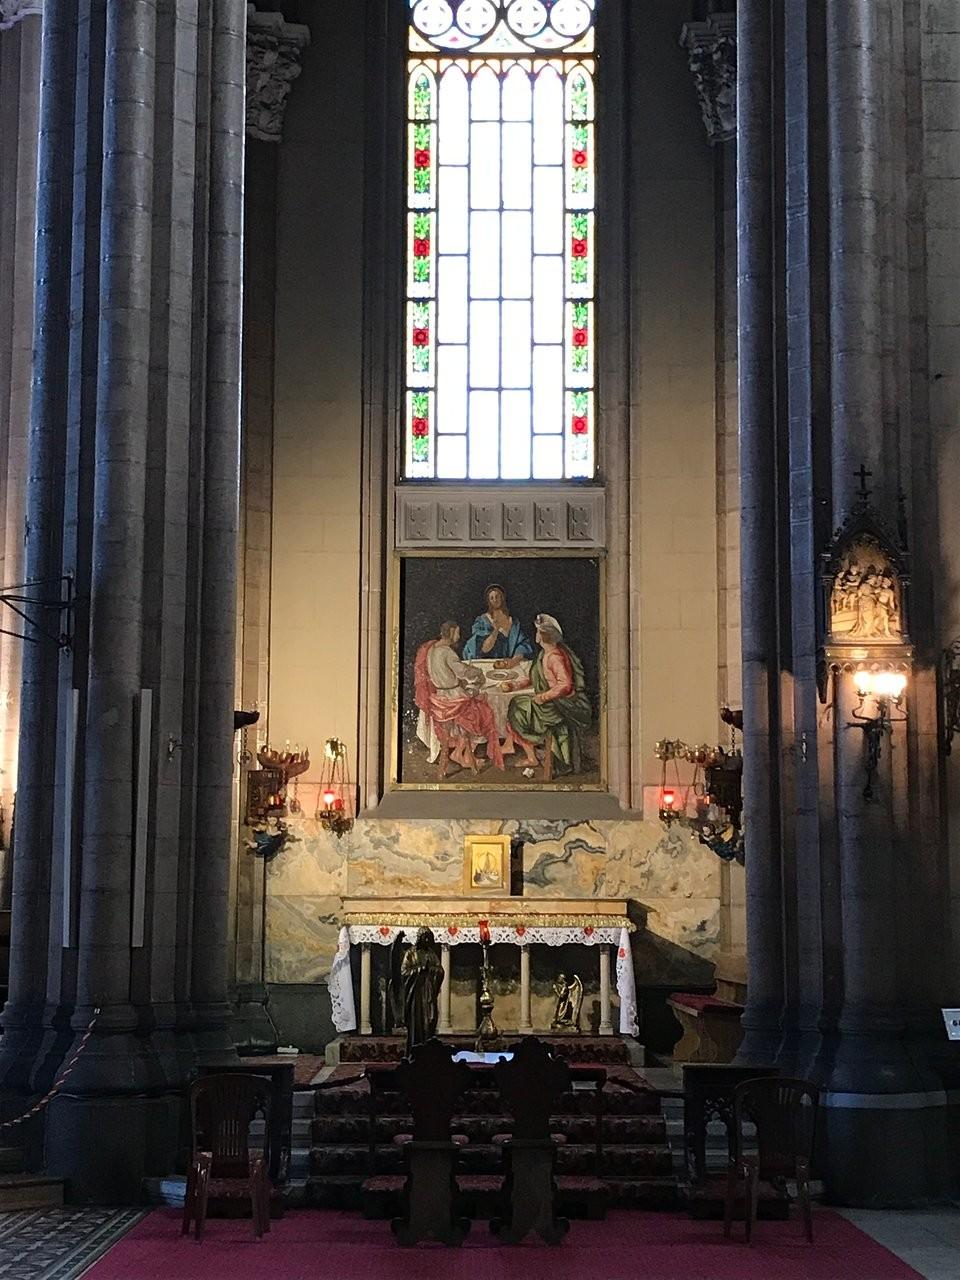 st-anthony-of-padua-church-istanbul (5).jpg